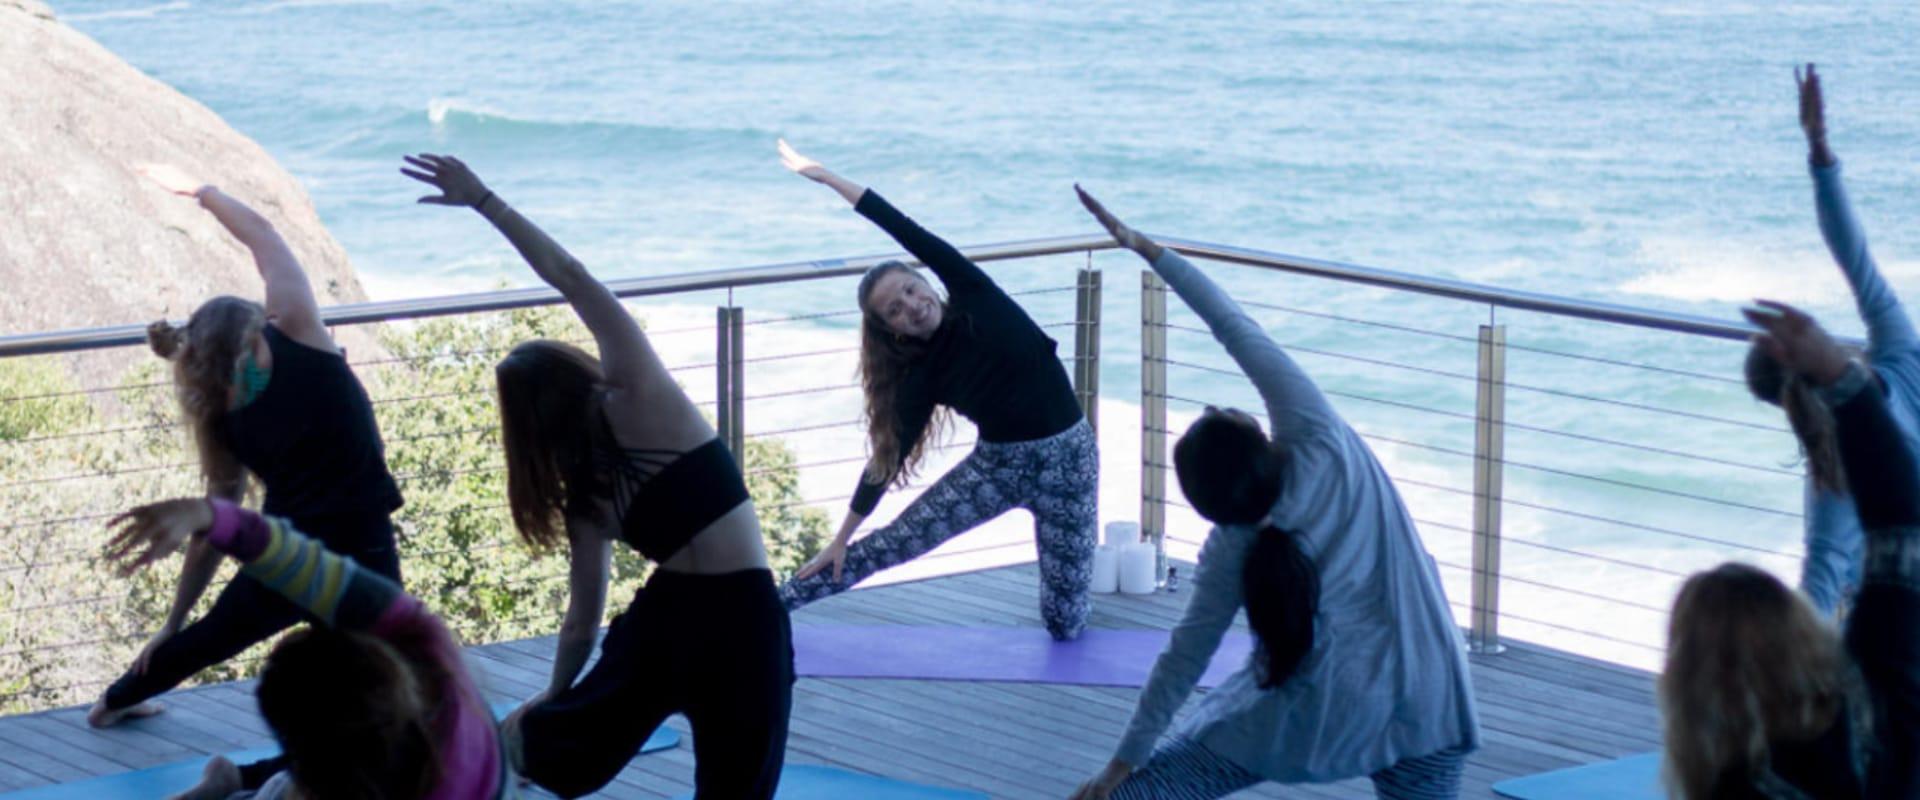 Private yoga classes in serene settings